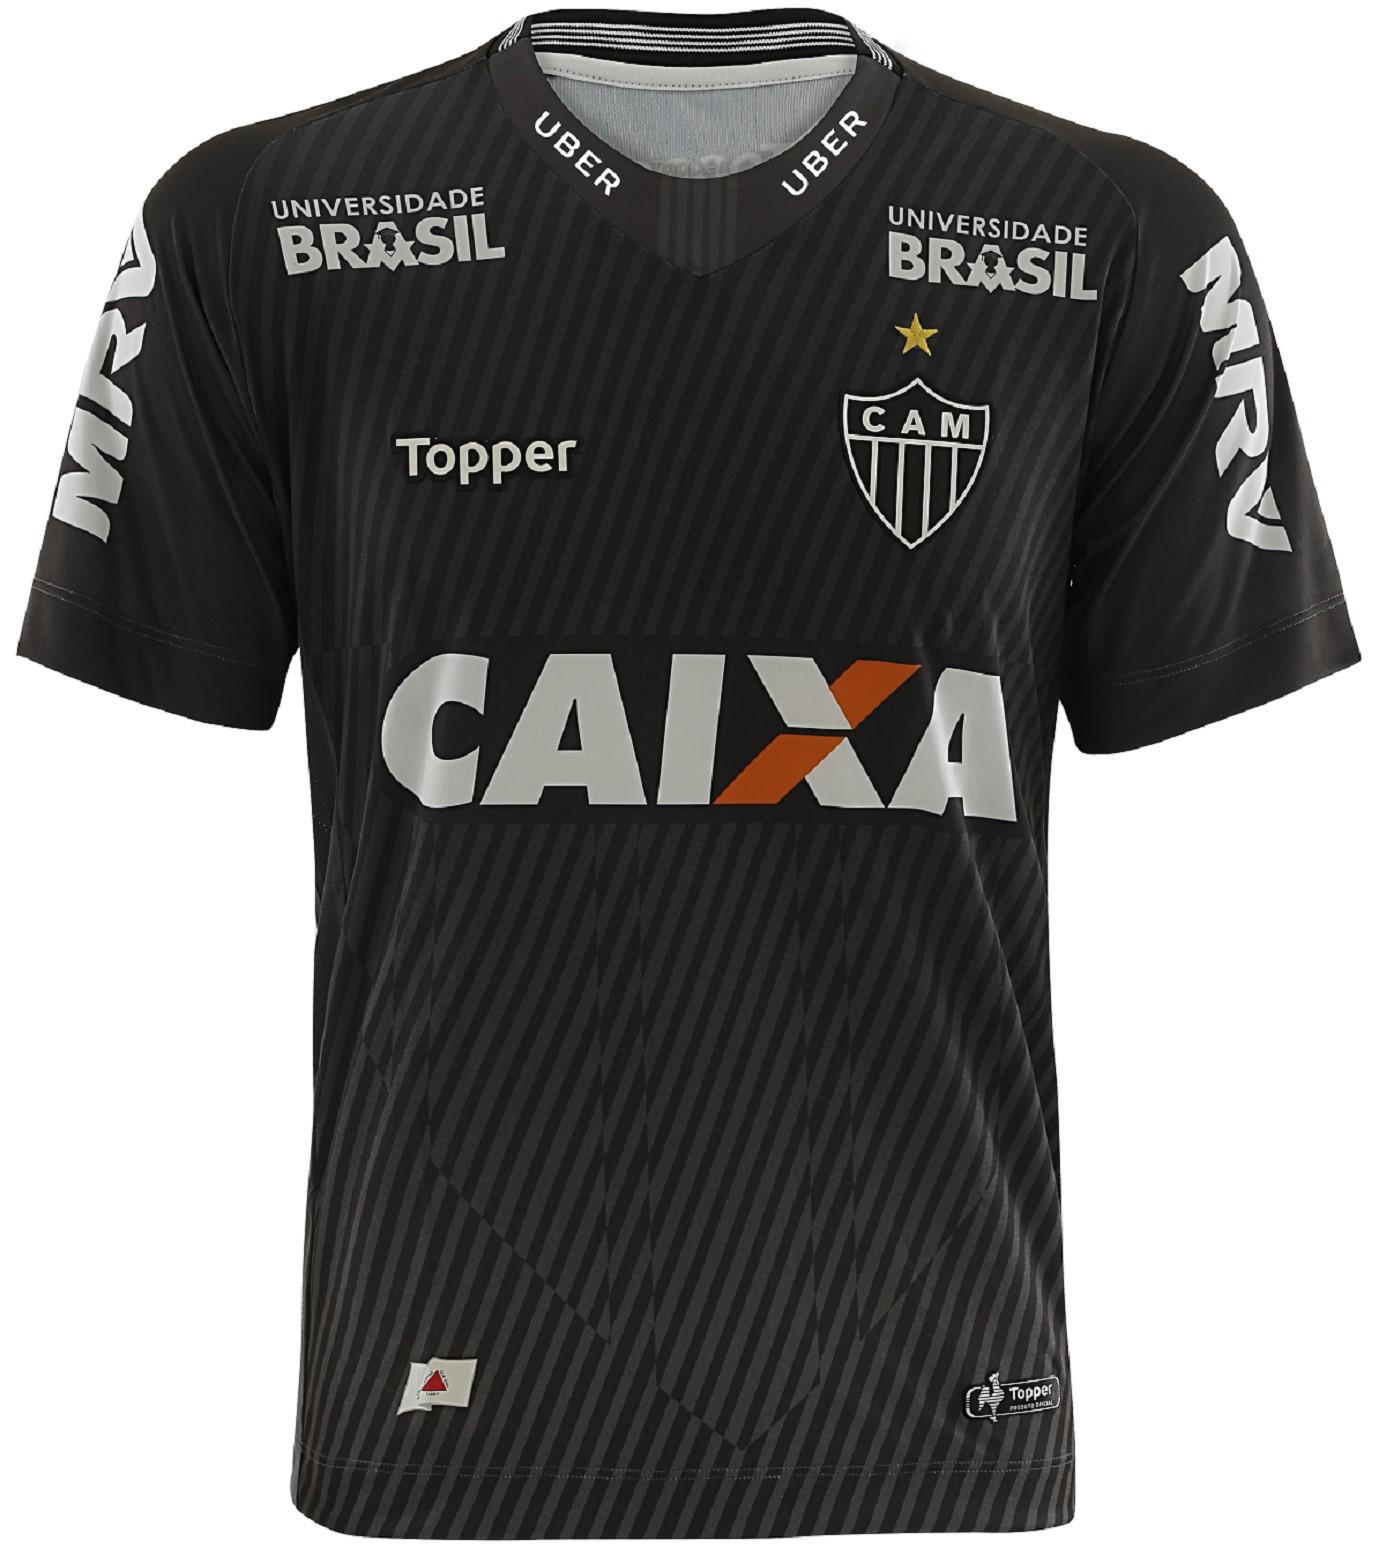 82621b7180 Camisa Atlético Mineiro 2018 - Goleiro I s n Topper Masculina ...